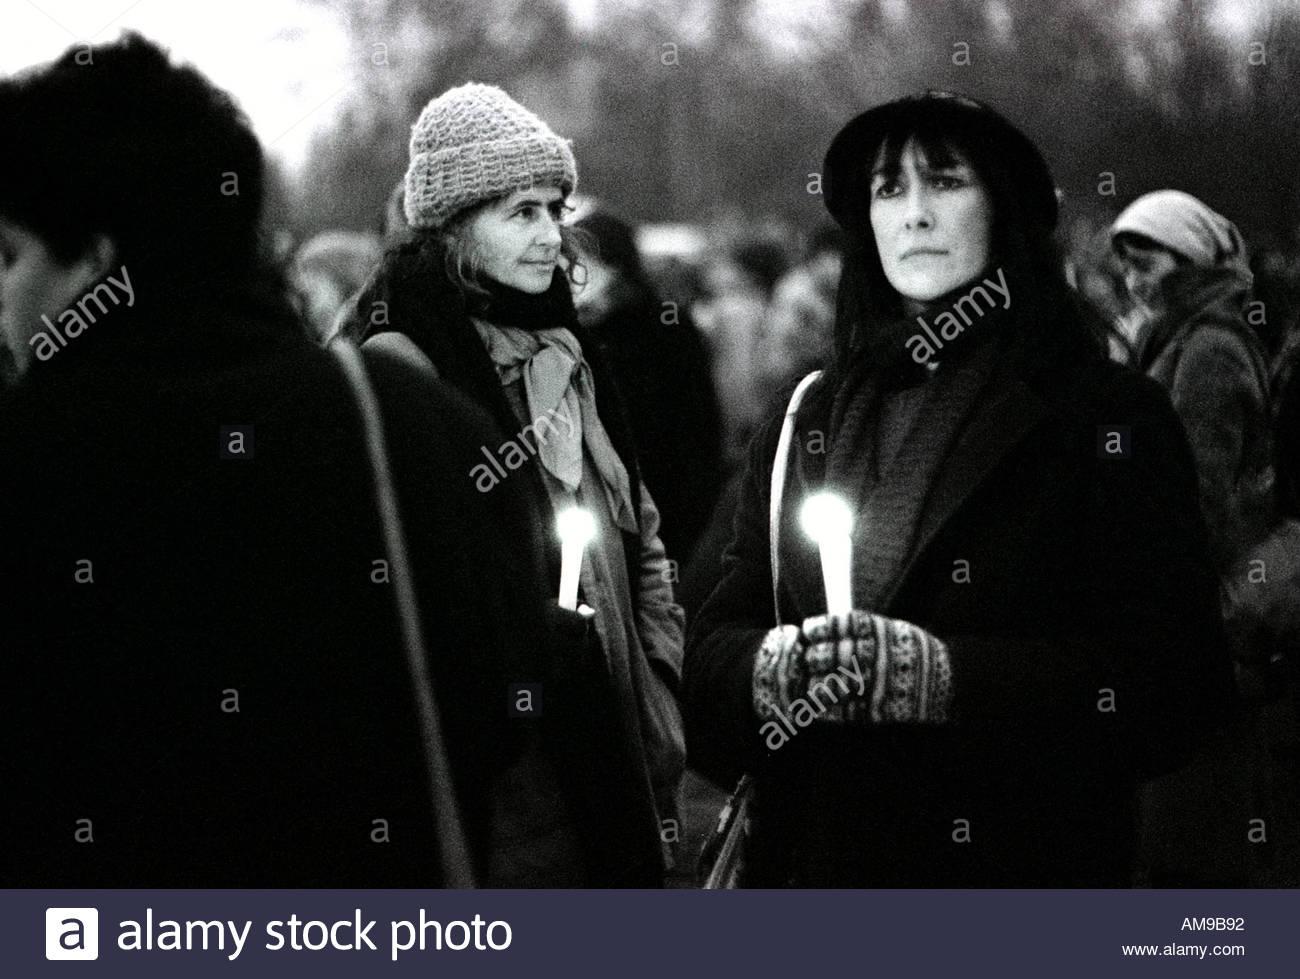 Candle Light Protest Vigil in Greenham Common American Air base in Berkshire 1984. Stockbild